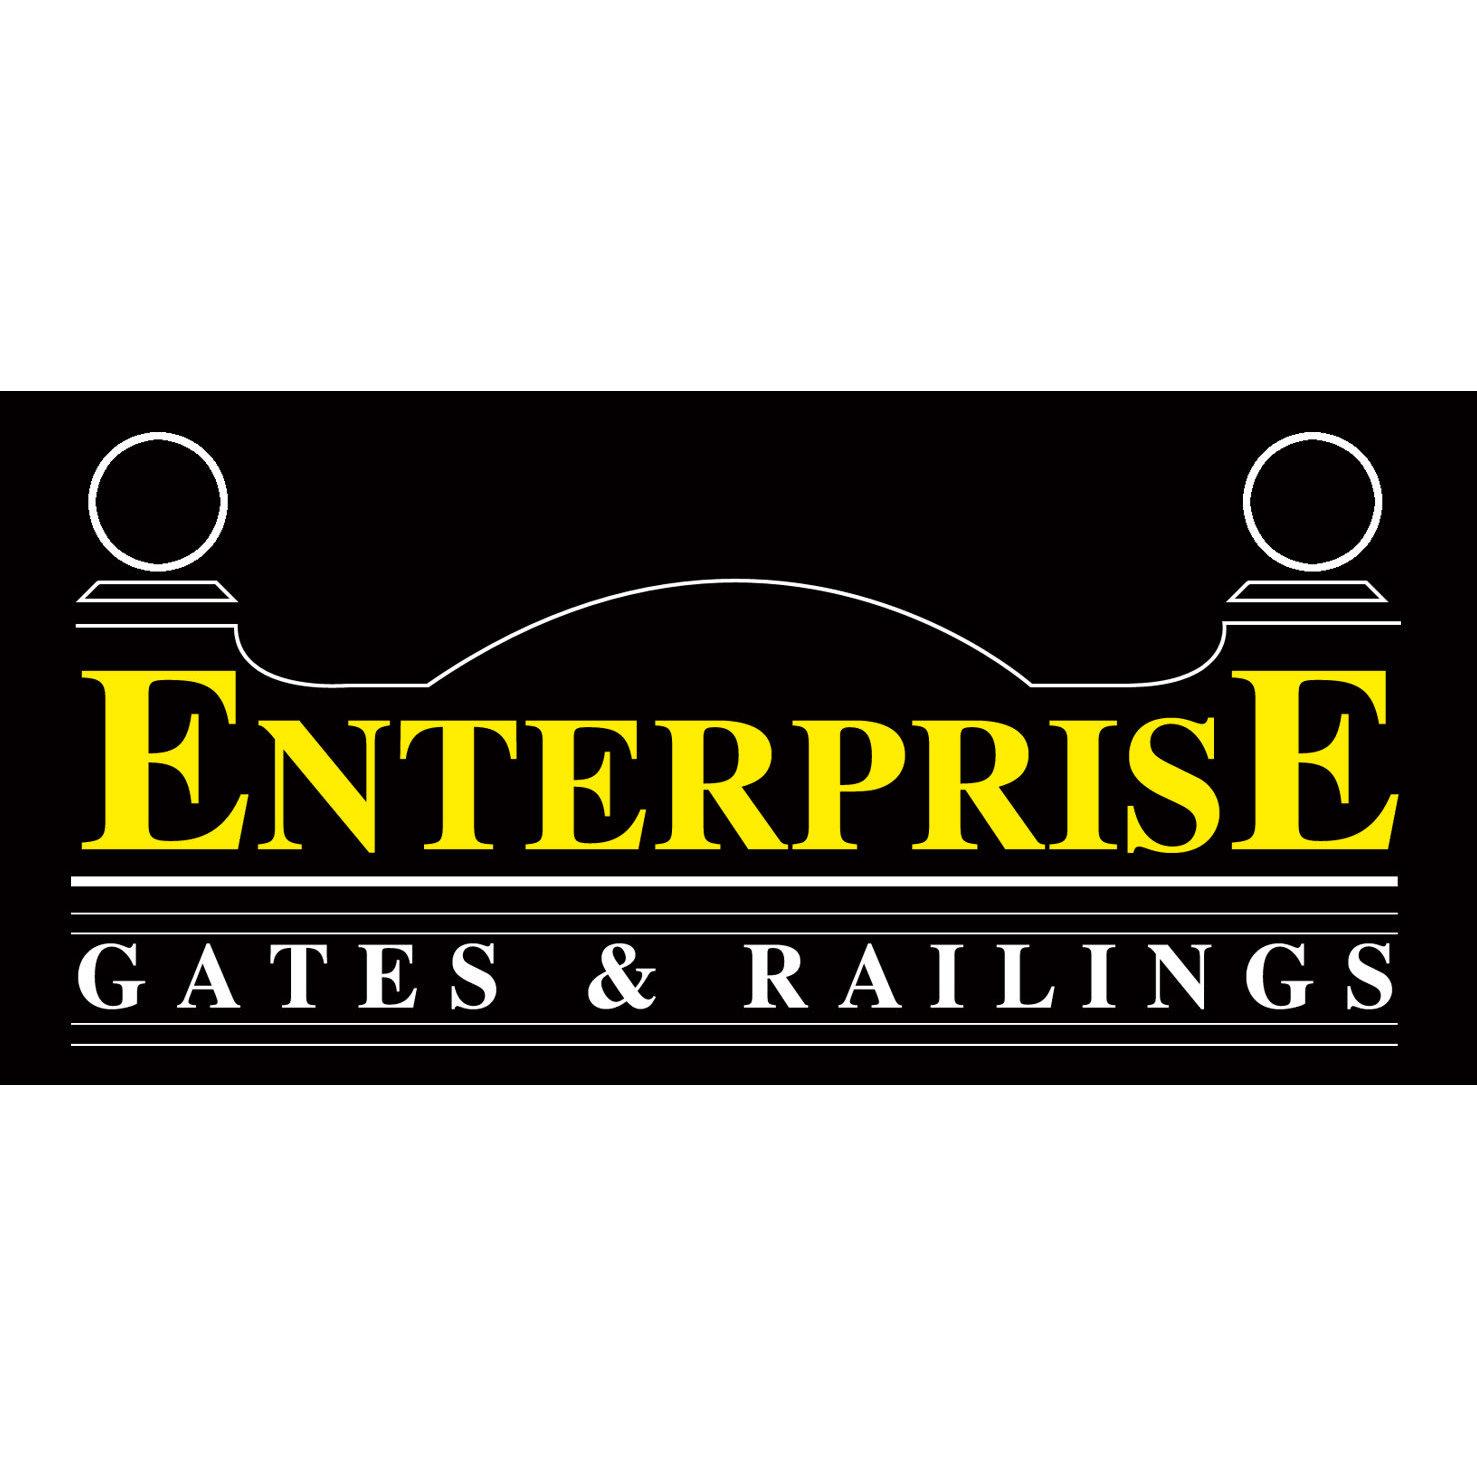 Enterprise Engineering - Stoke-On-Trent, Staffordshire ST3 4QR - 01782 593122 | ShowMeLocal.com